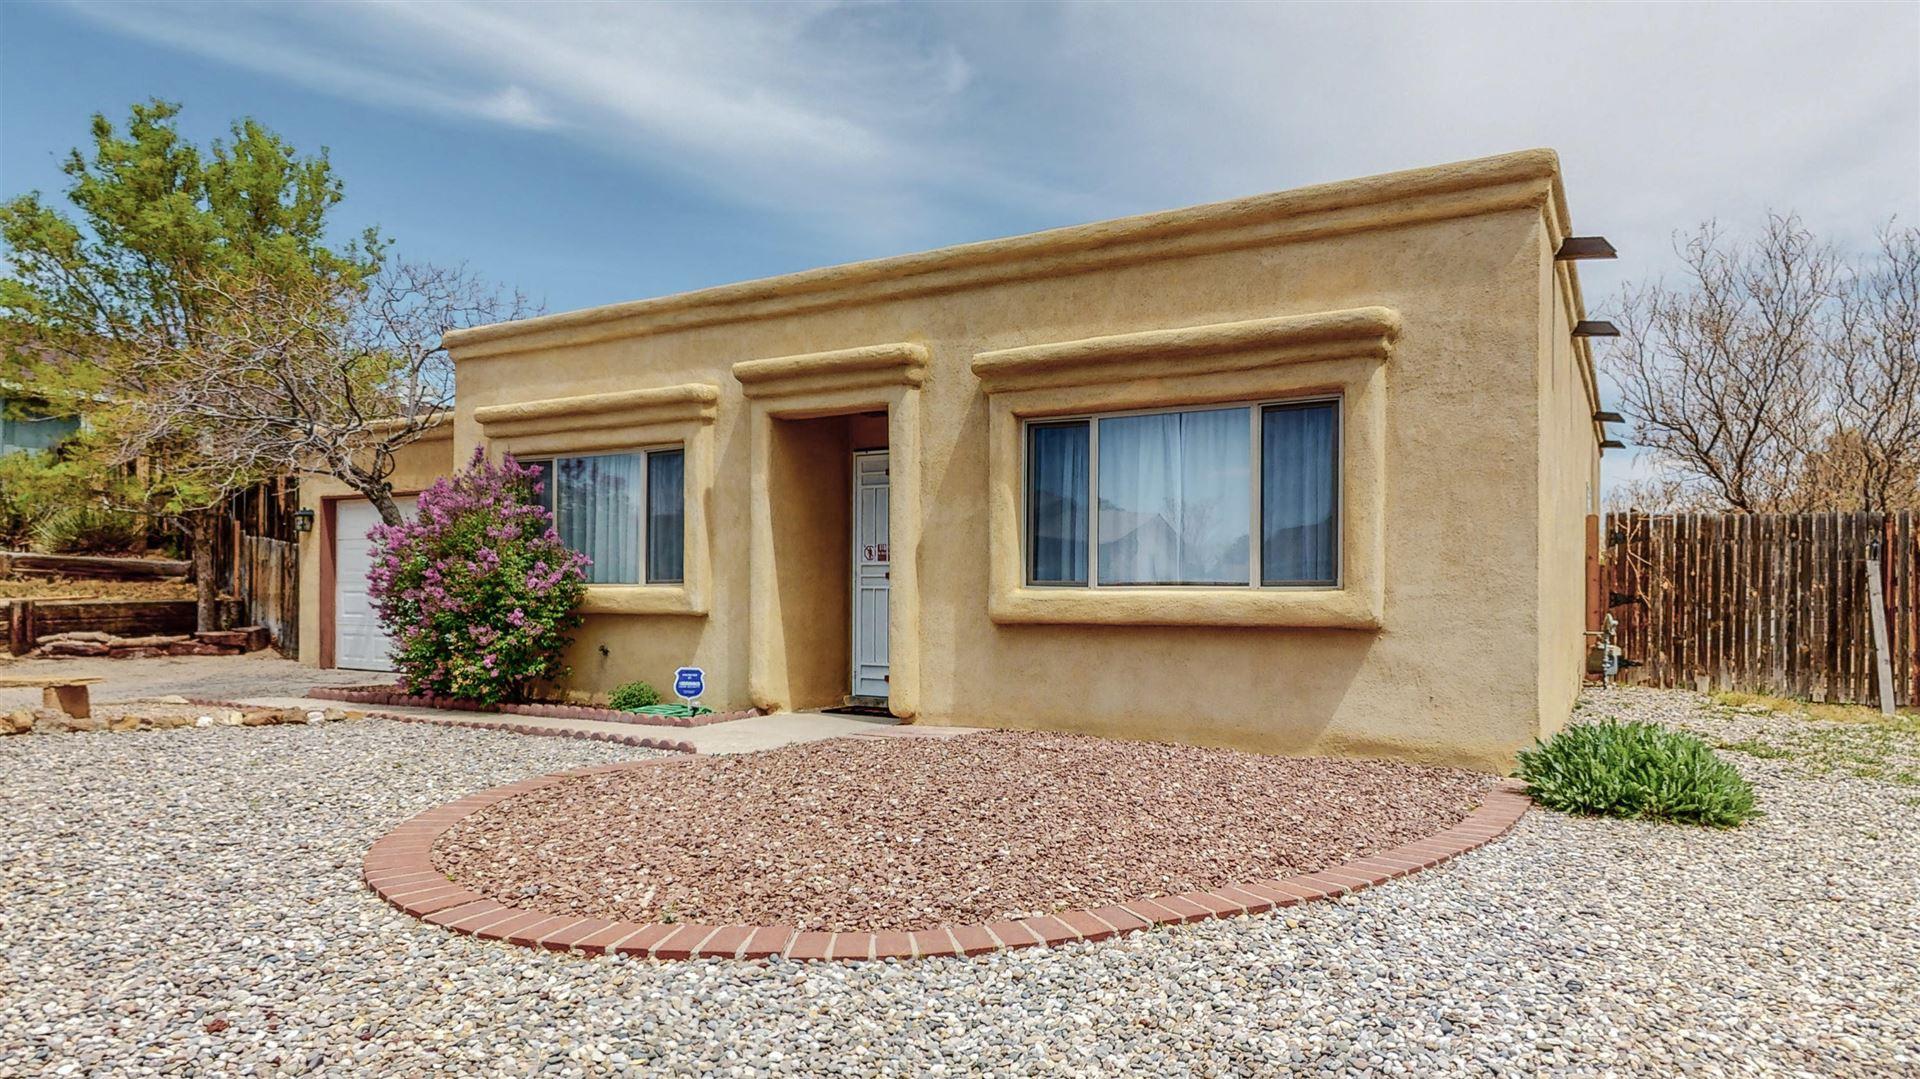 Photo of 1615 BOREALIS Avenue SE, Rio Rancho, NM 87124 (MLS # 989655)